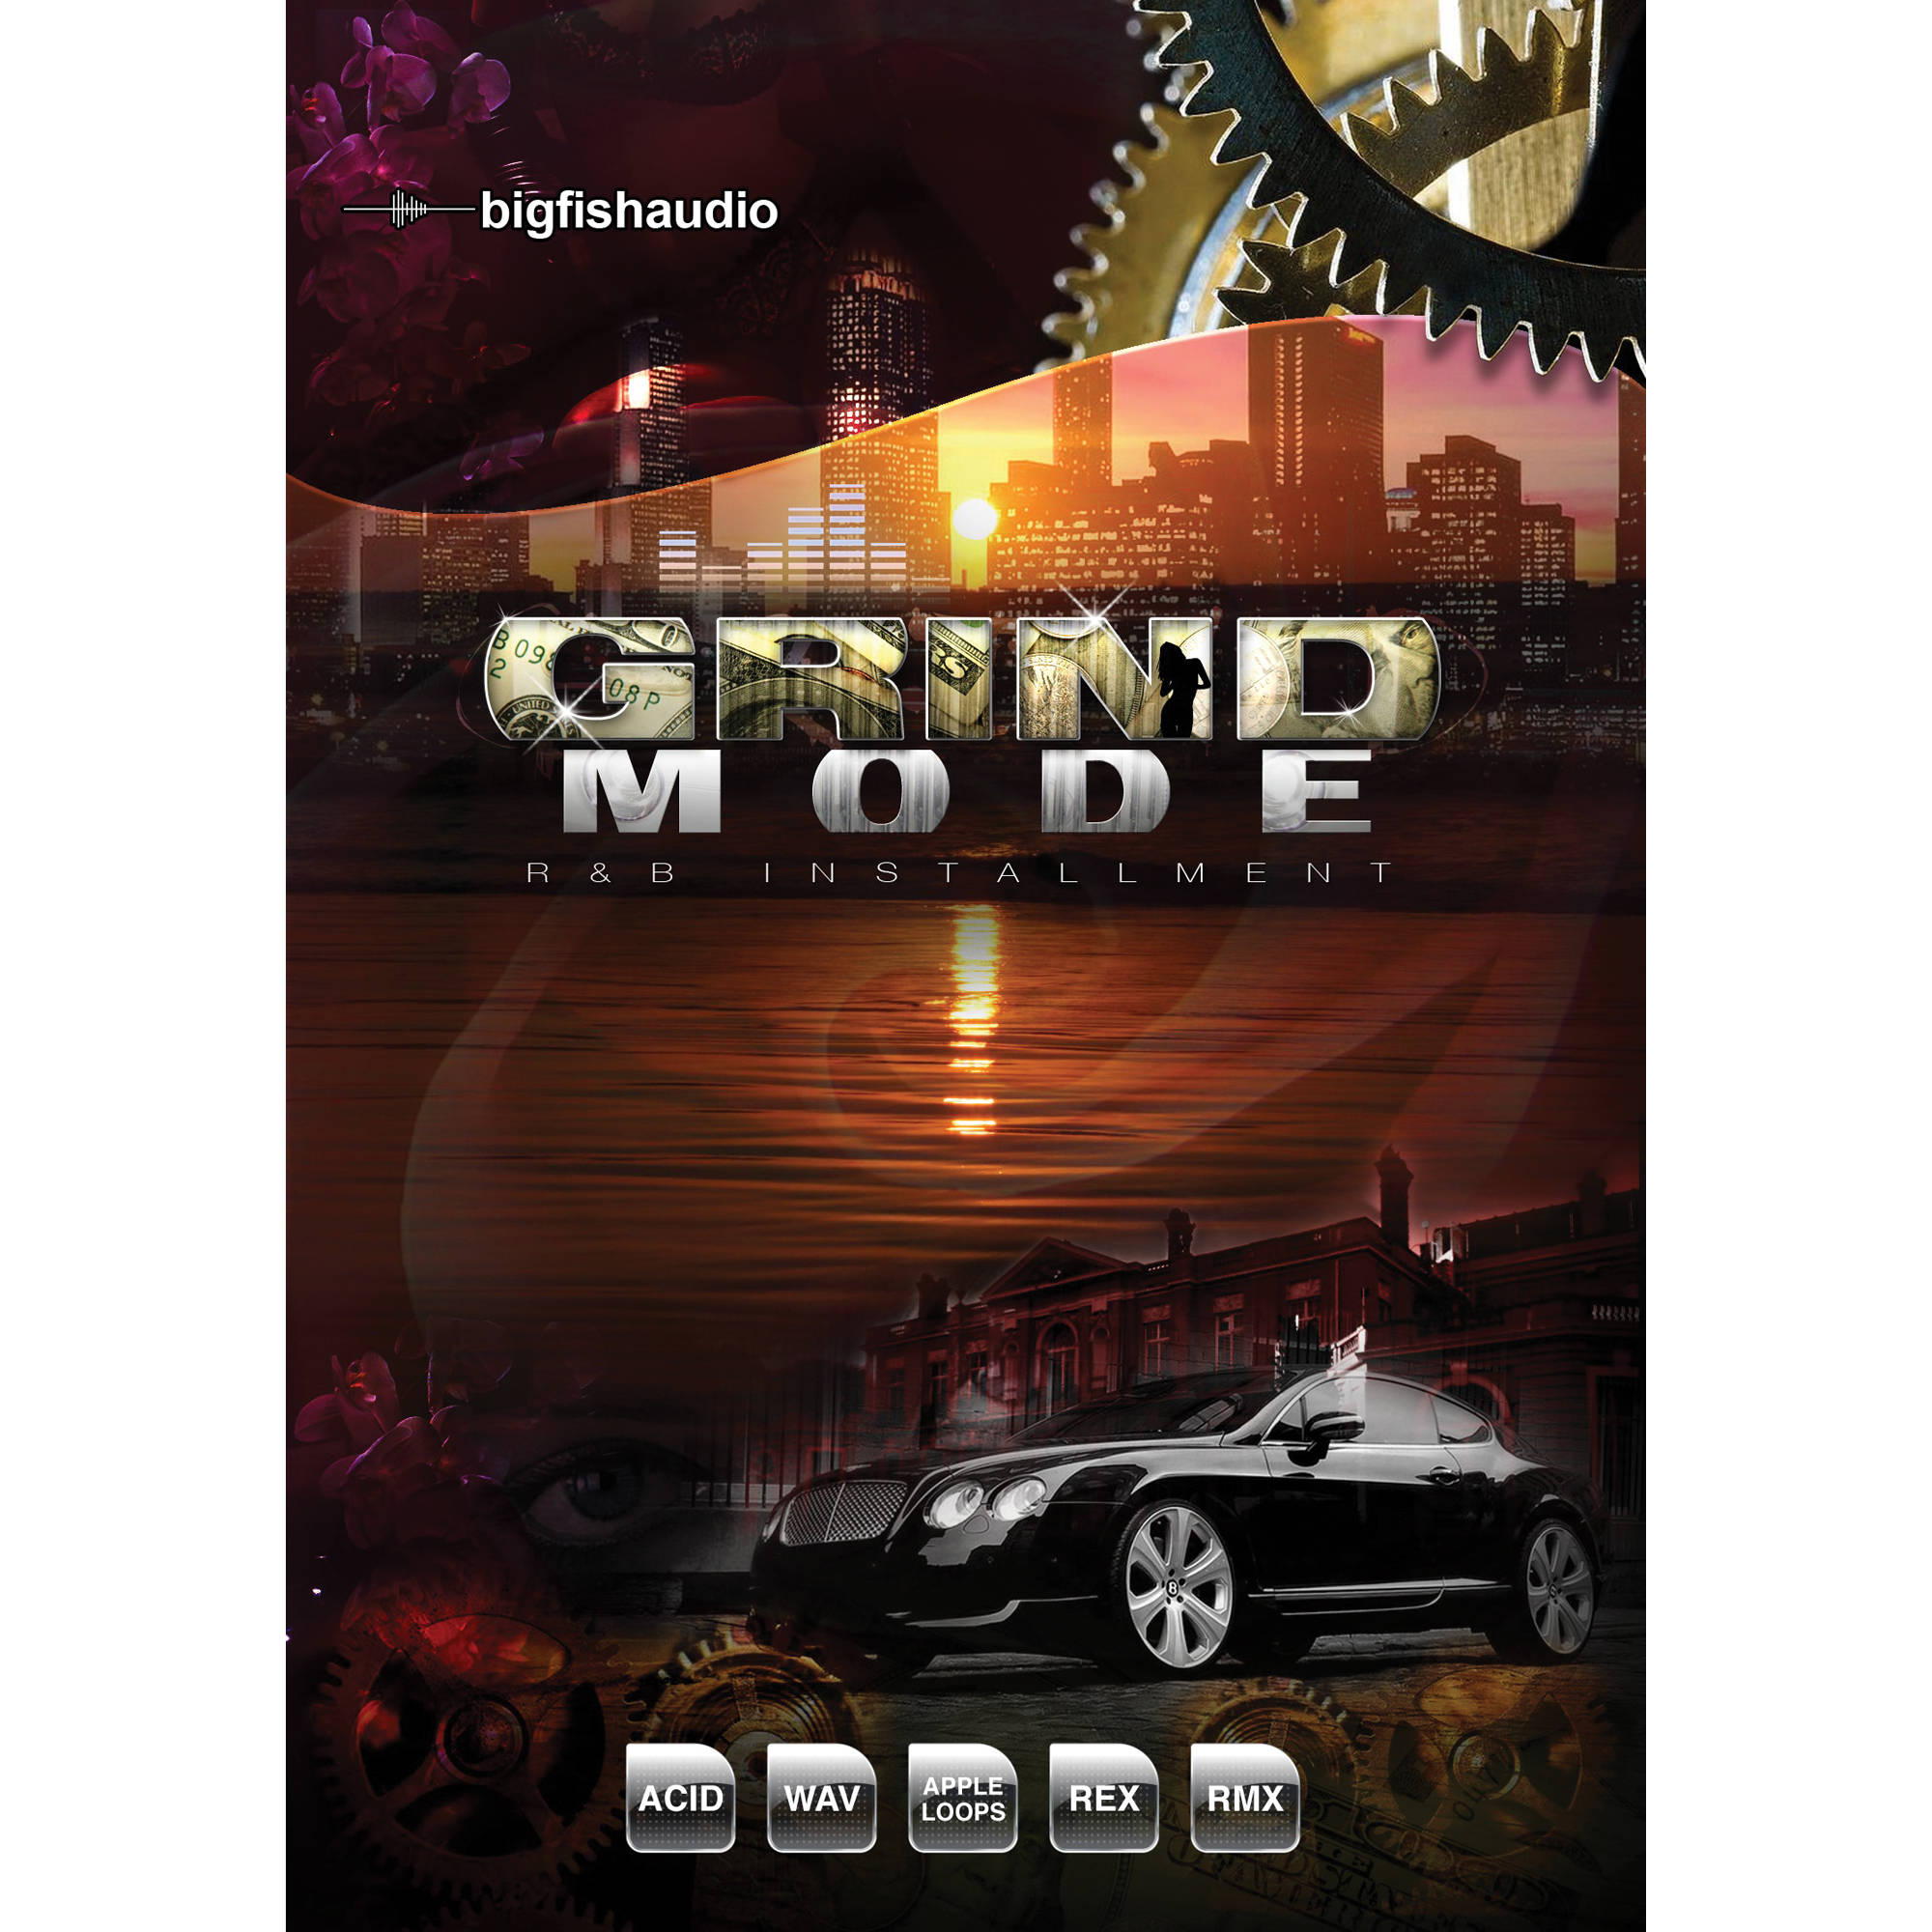 Big fish audio grind mode dvd grnd1 orwxz b h photo video for Big fish audio